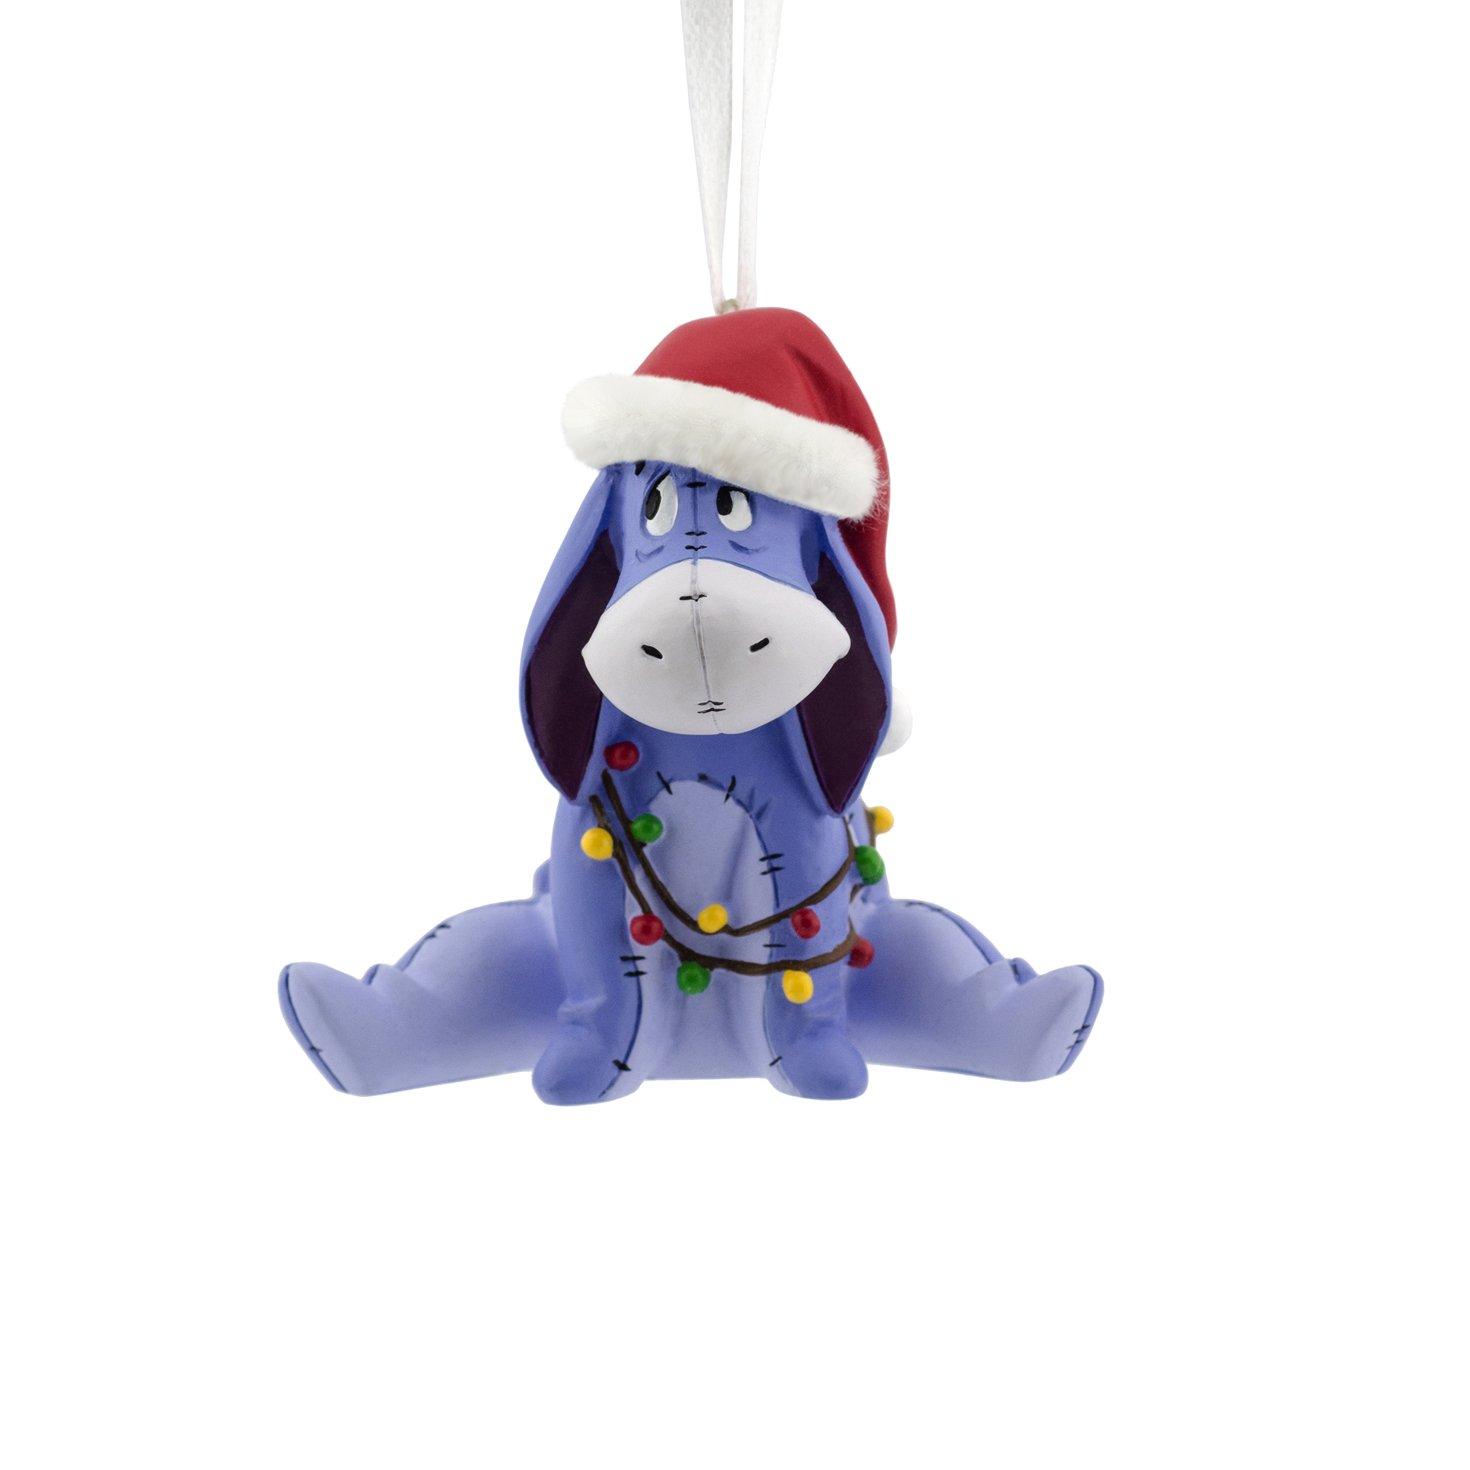 Hallmark Disney Winnie the Pooh  Eeyore Holiday Ornament